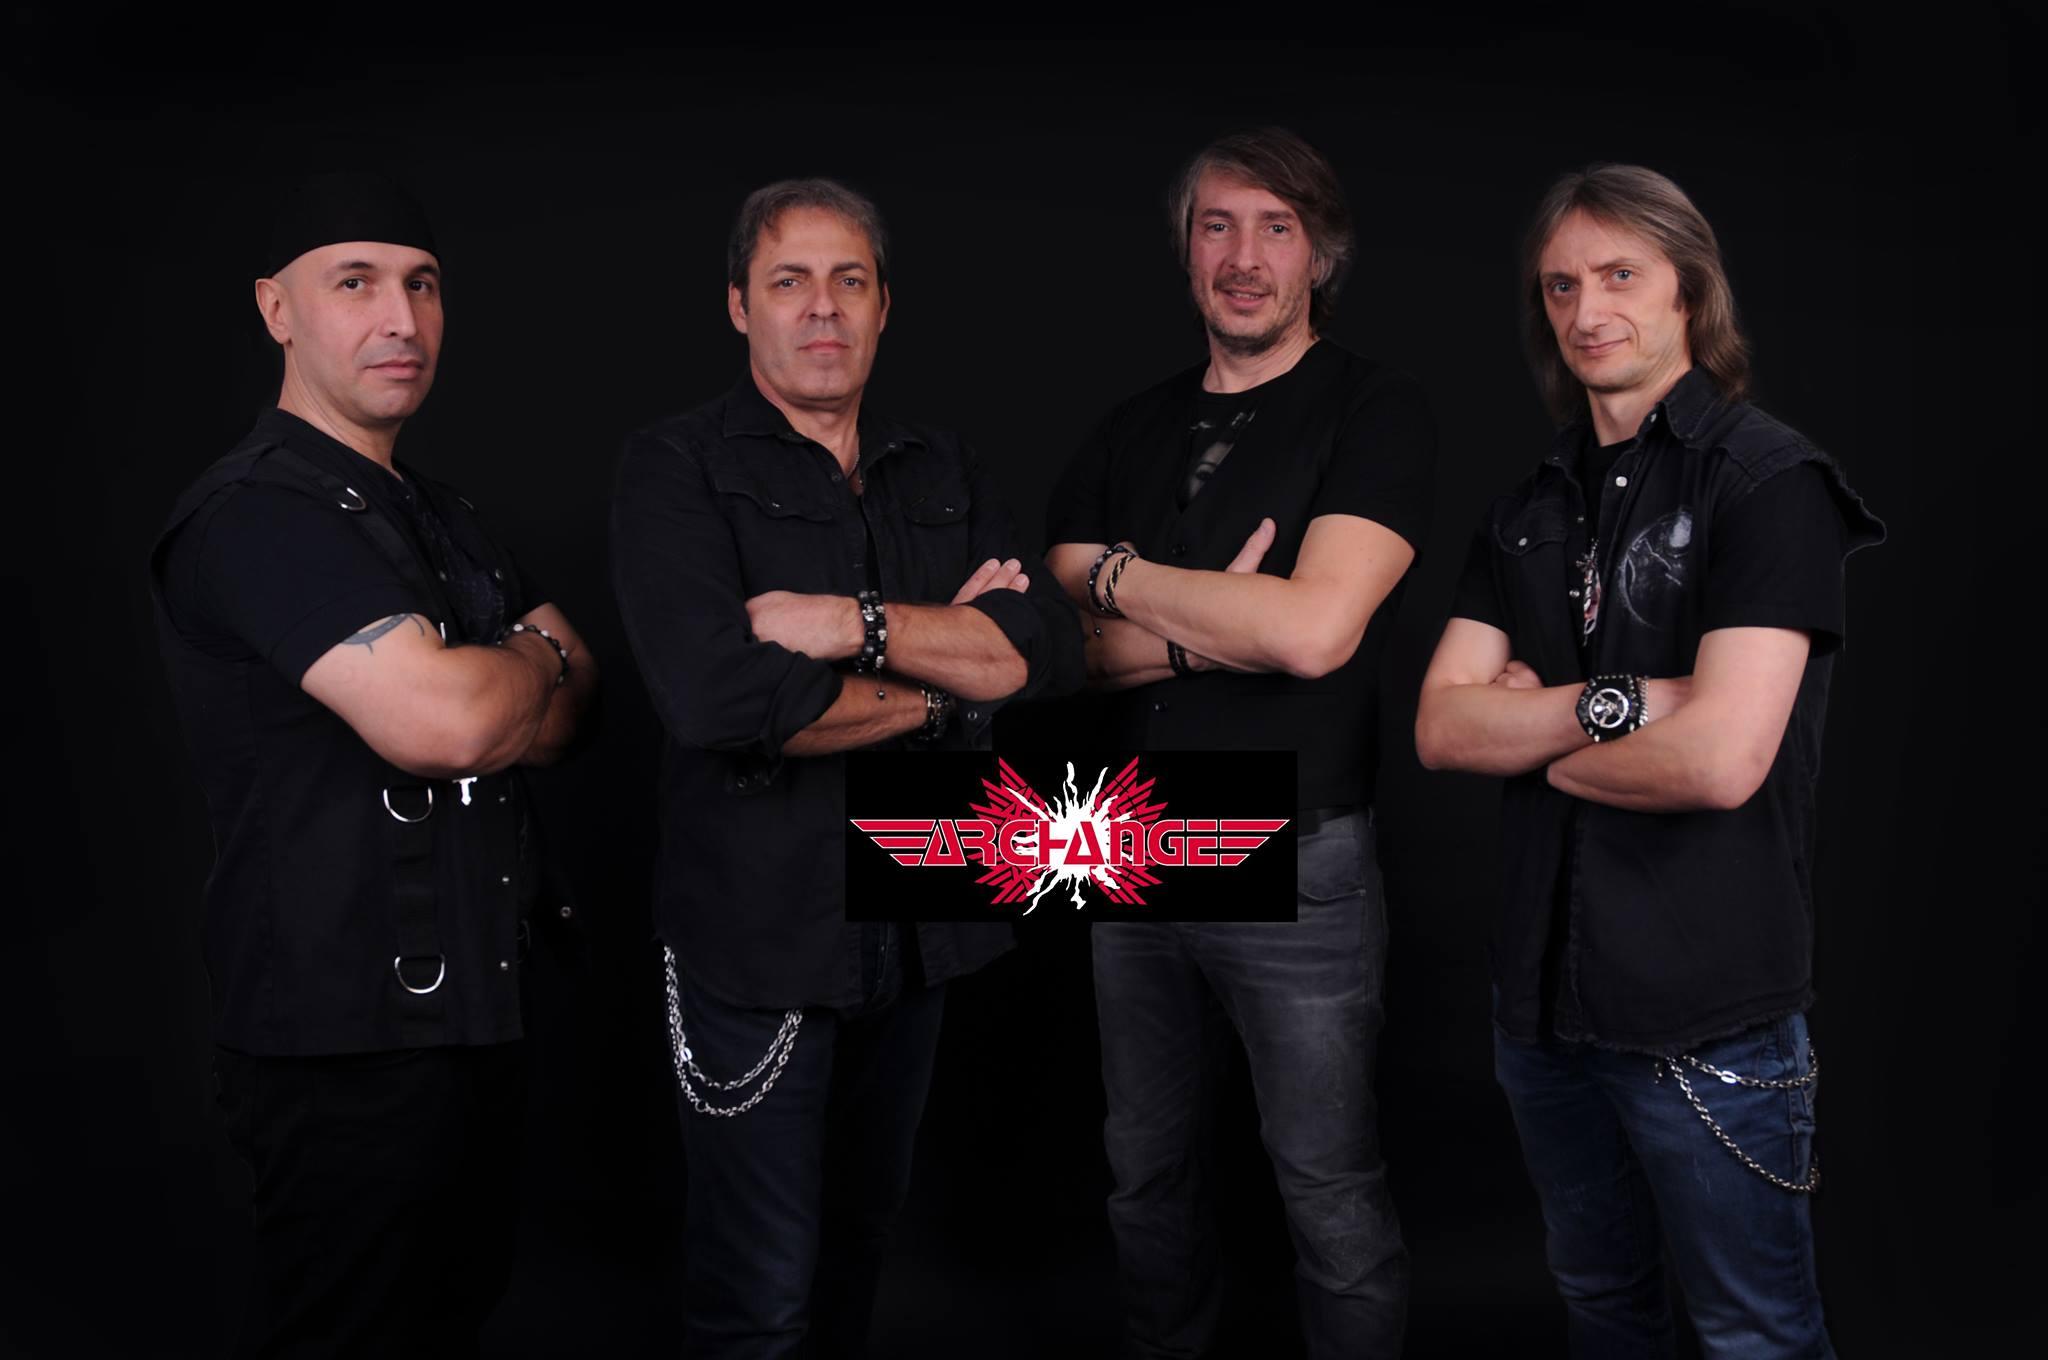 ARCHANGE Flashback (2017) Hard Rock Grenoble 17492310